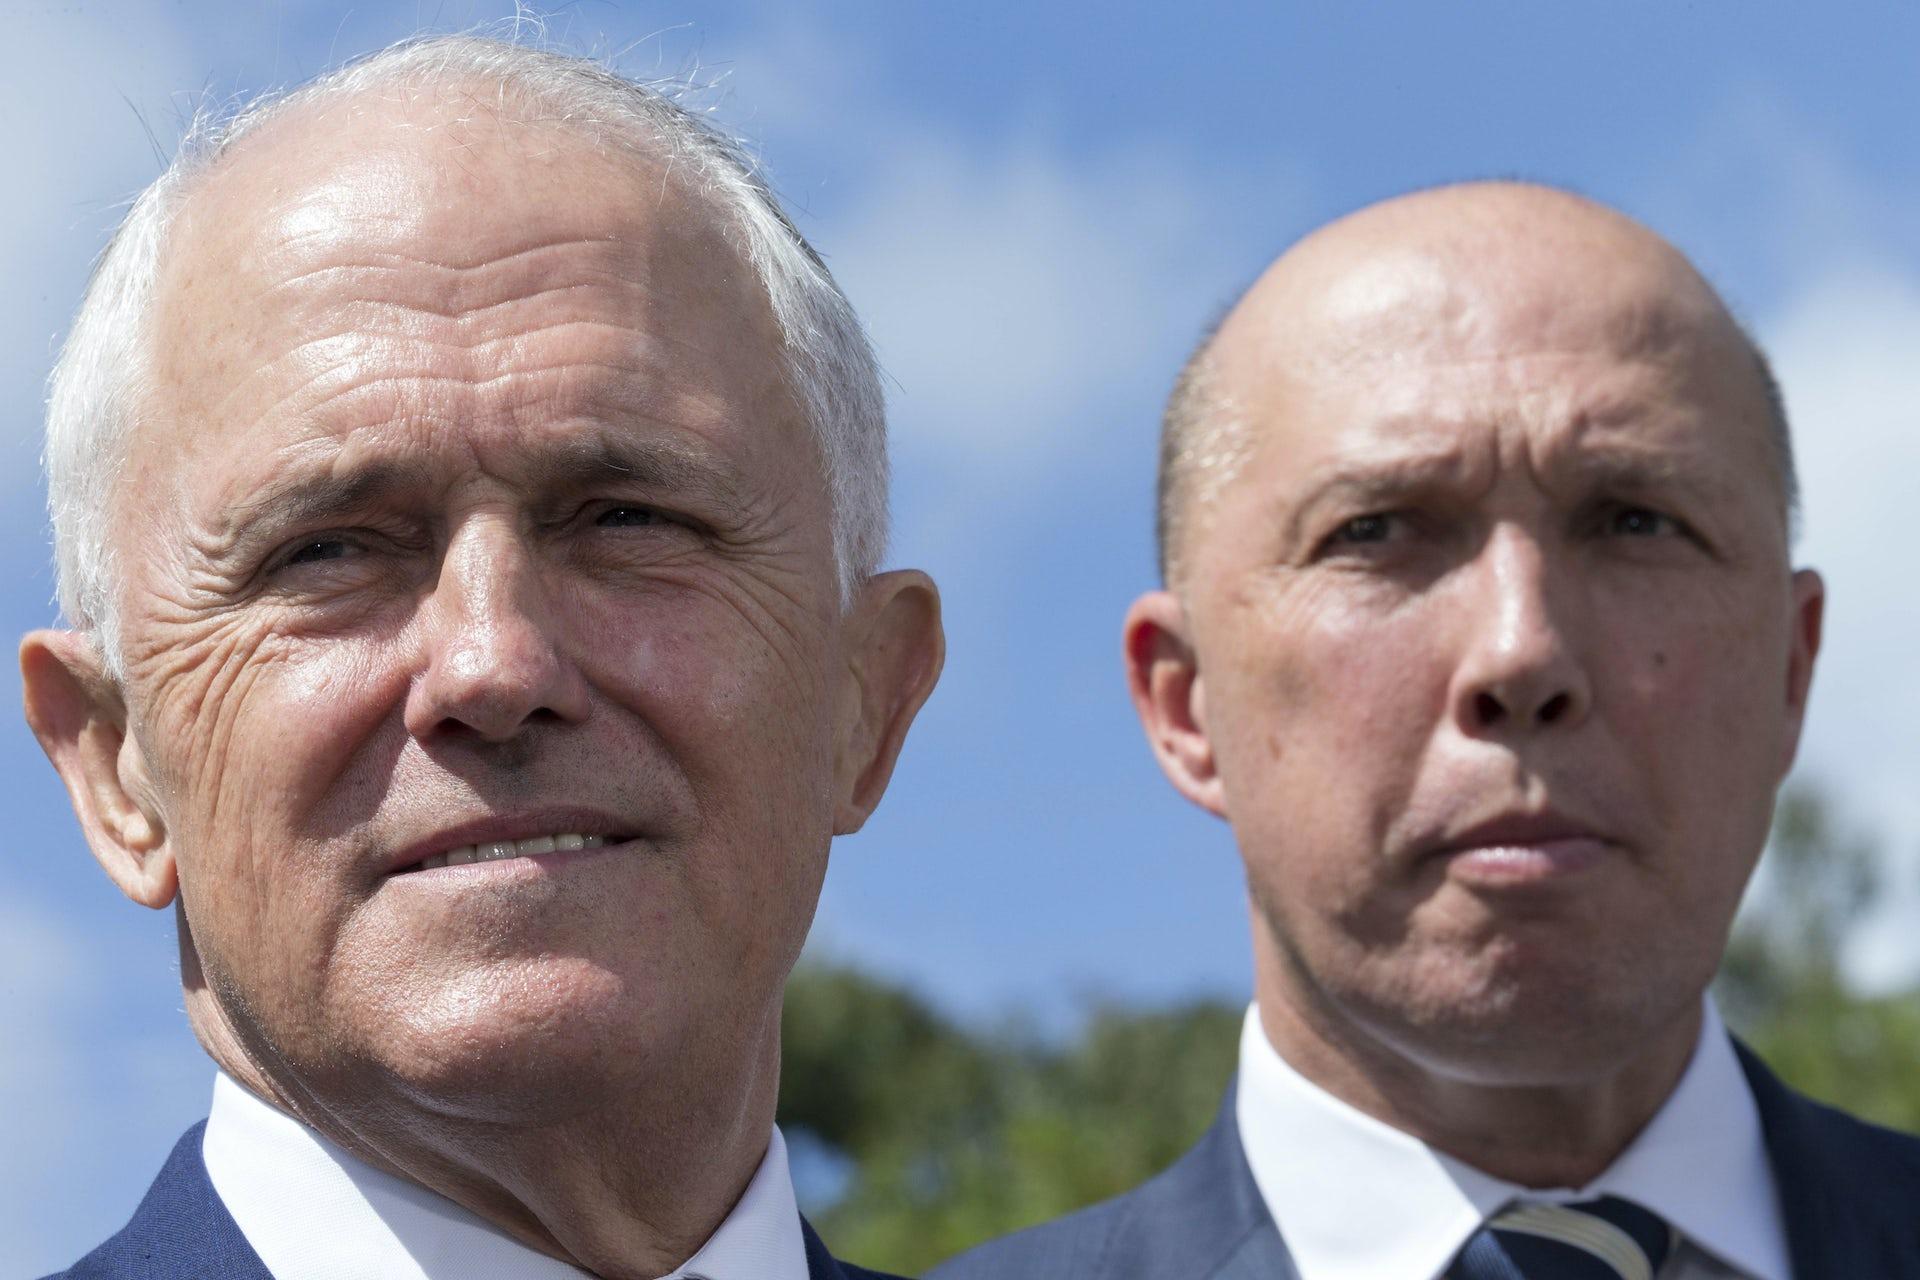 Dutton v Turnbull is the latest manifestation of the splintering of the centre-right in Australian politics